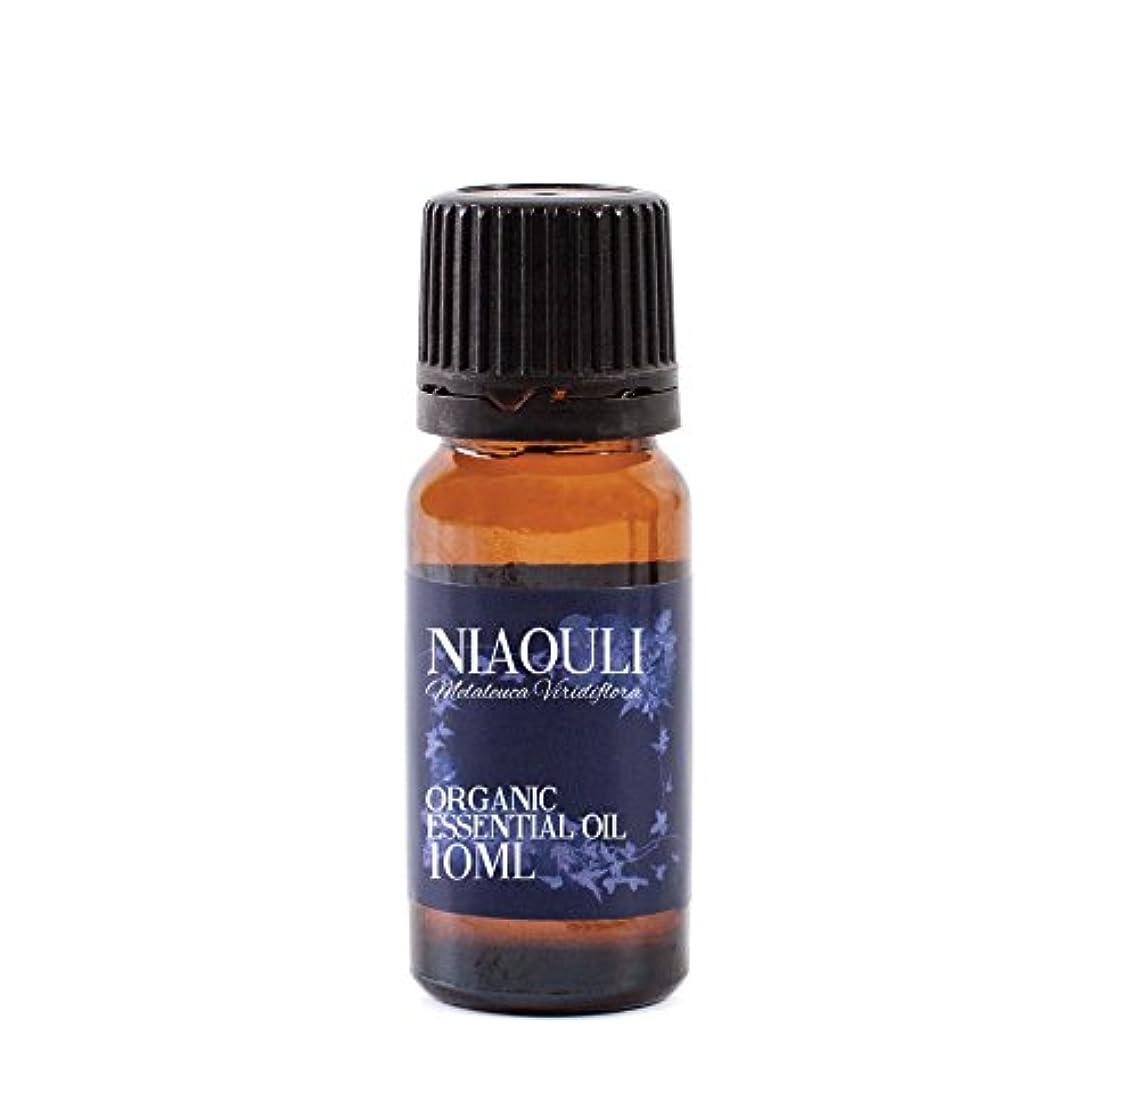 Niaouli Organic Essential Oil - 10ml - 100% Pure